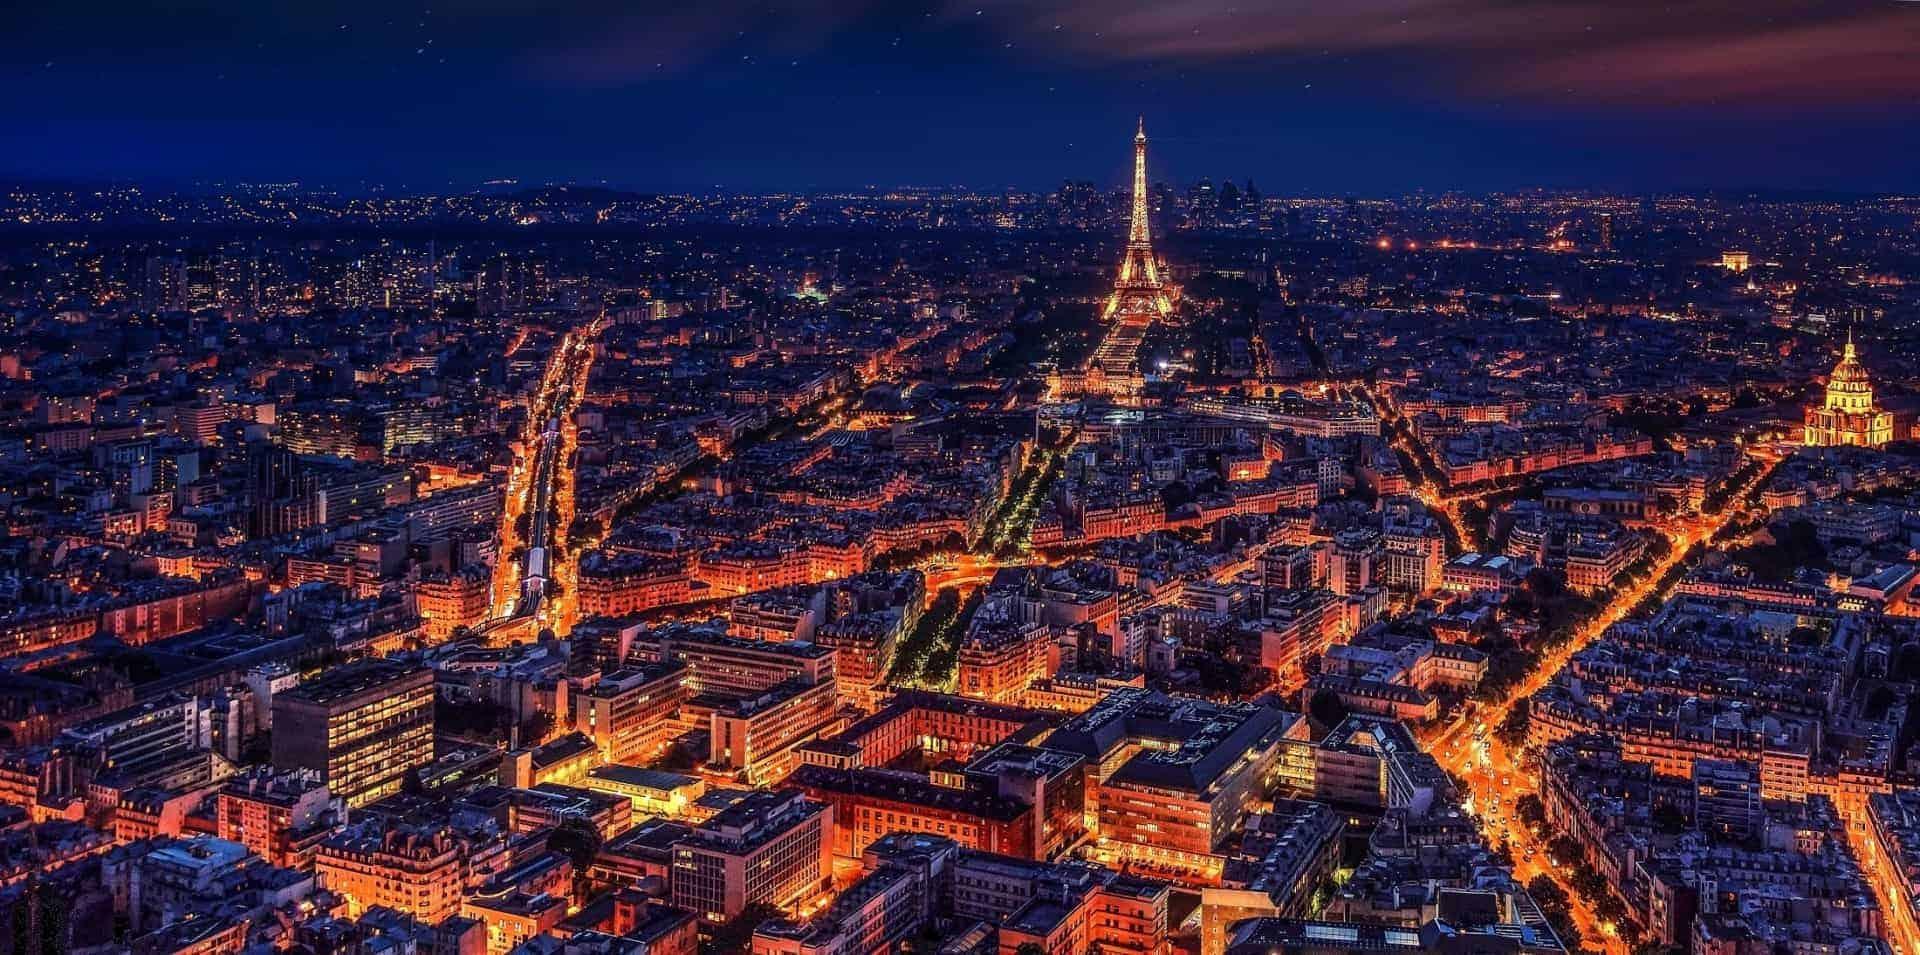 Modern-day Paris